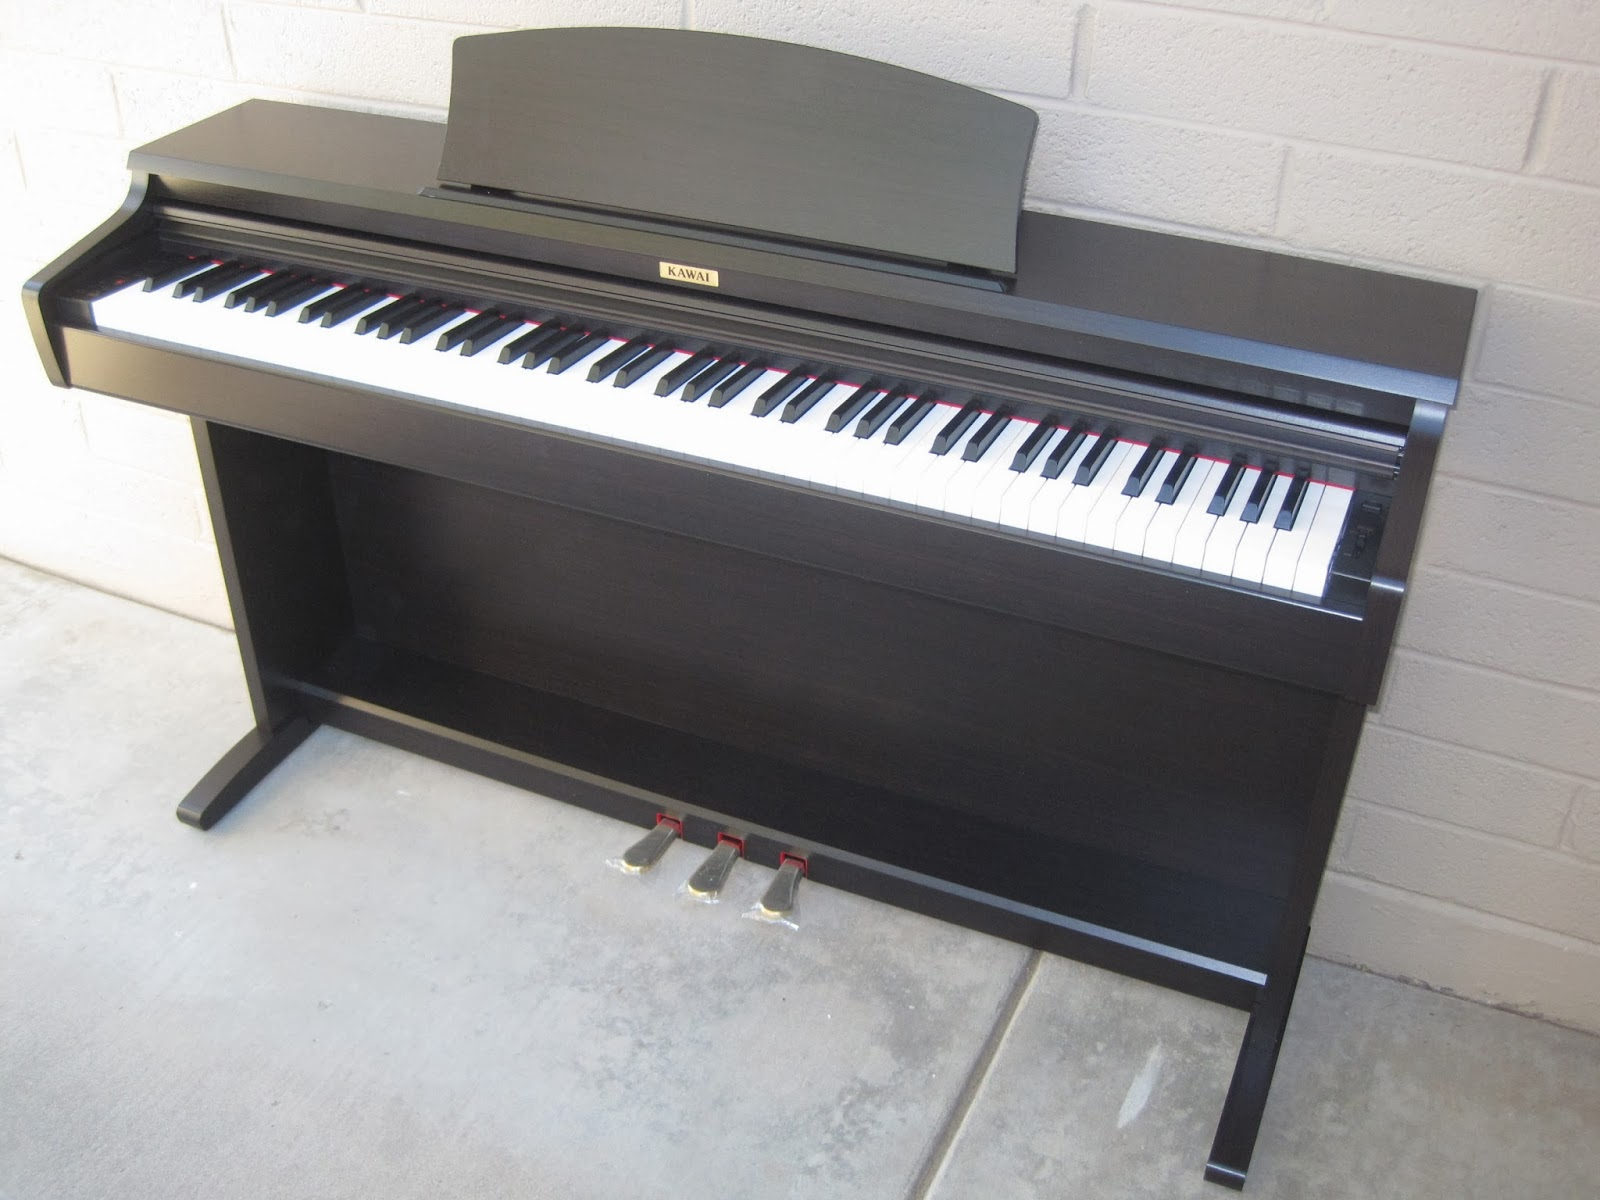 az piano reviews review kawai kdp90 digital piano impressive recommended digital piano. Black Bedroom Furniture Sets. Home Design Ideas